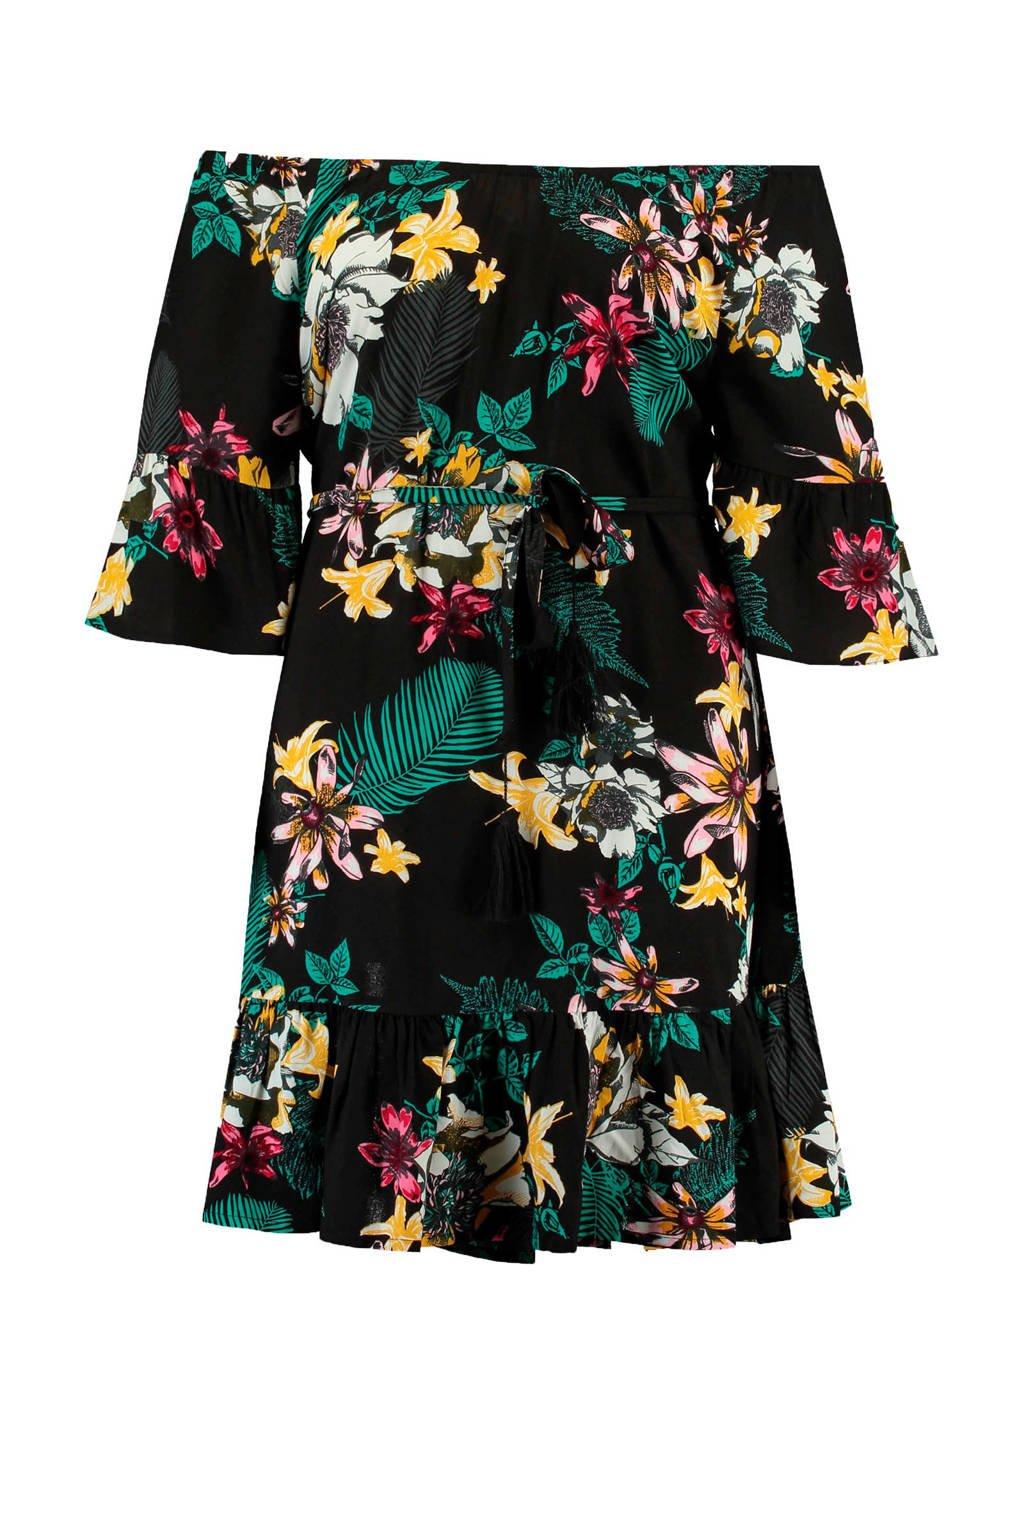 MS Mode gebloemde off shoulder jurk zwart, Zwart